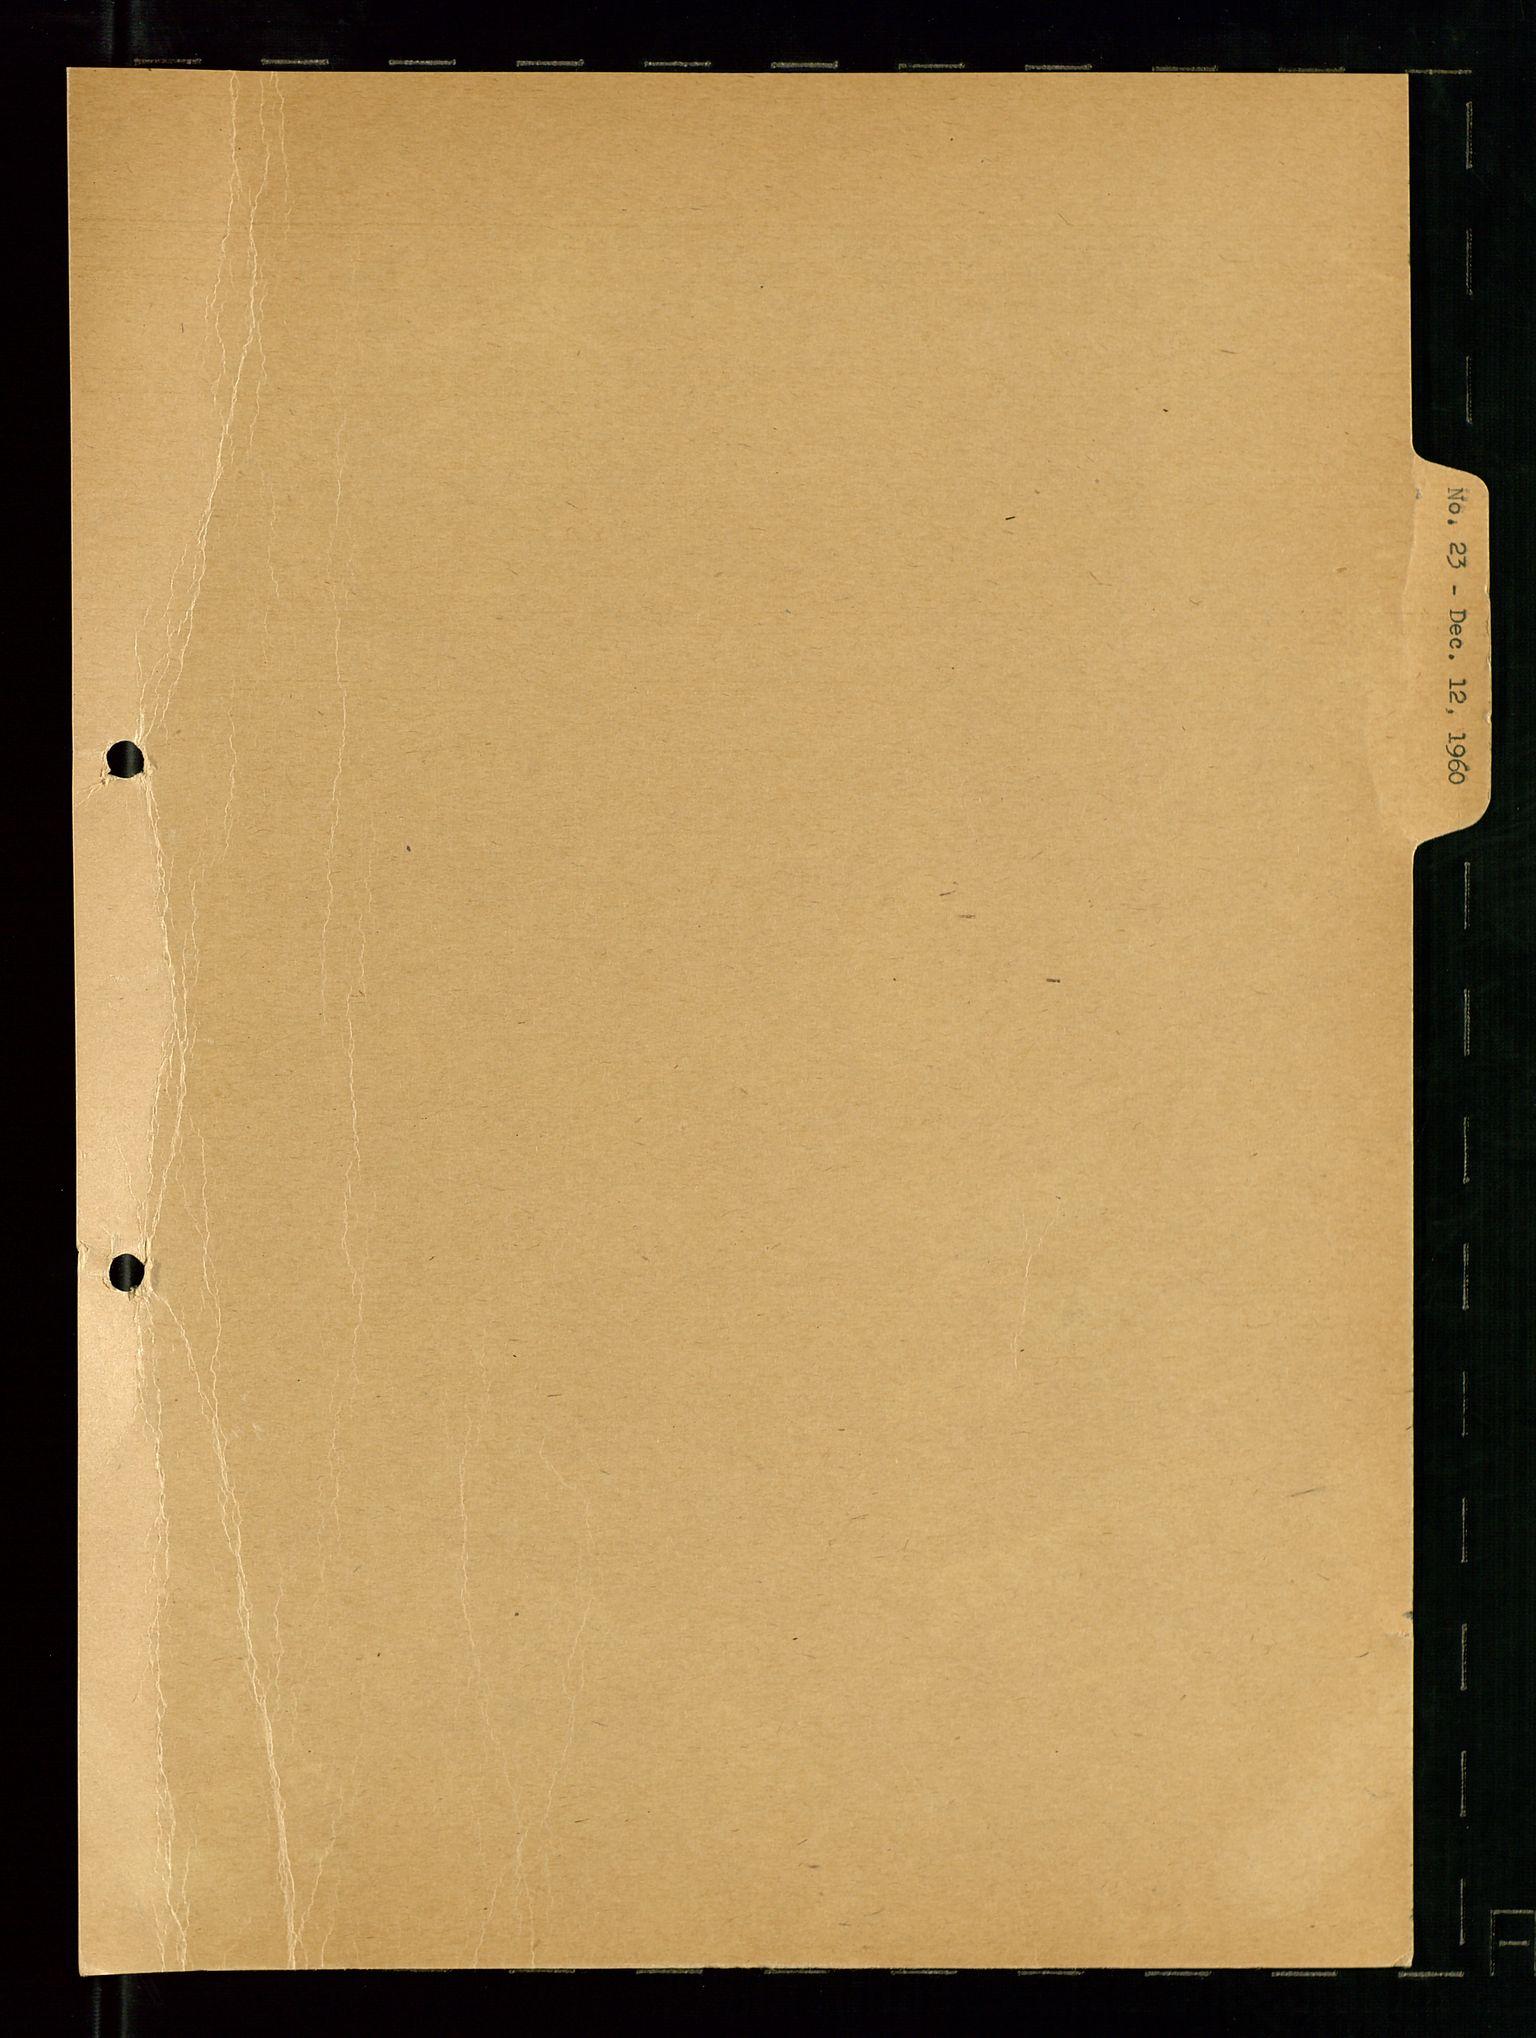 SAST, PA 1537 - A/S Essoraffineriet Norge, A/Aa/L0001: Styremøter, 1959-1961, s. 77